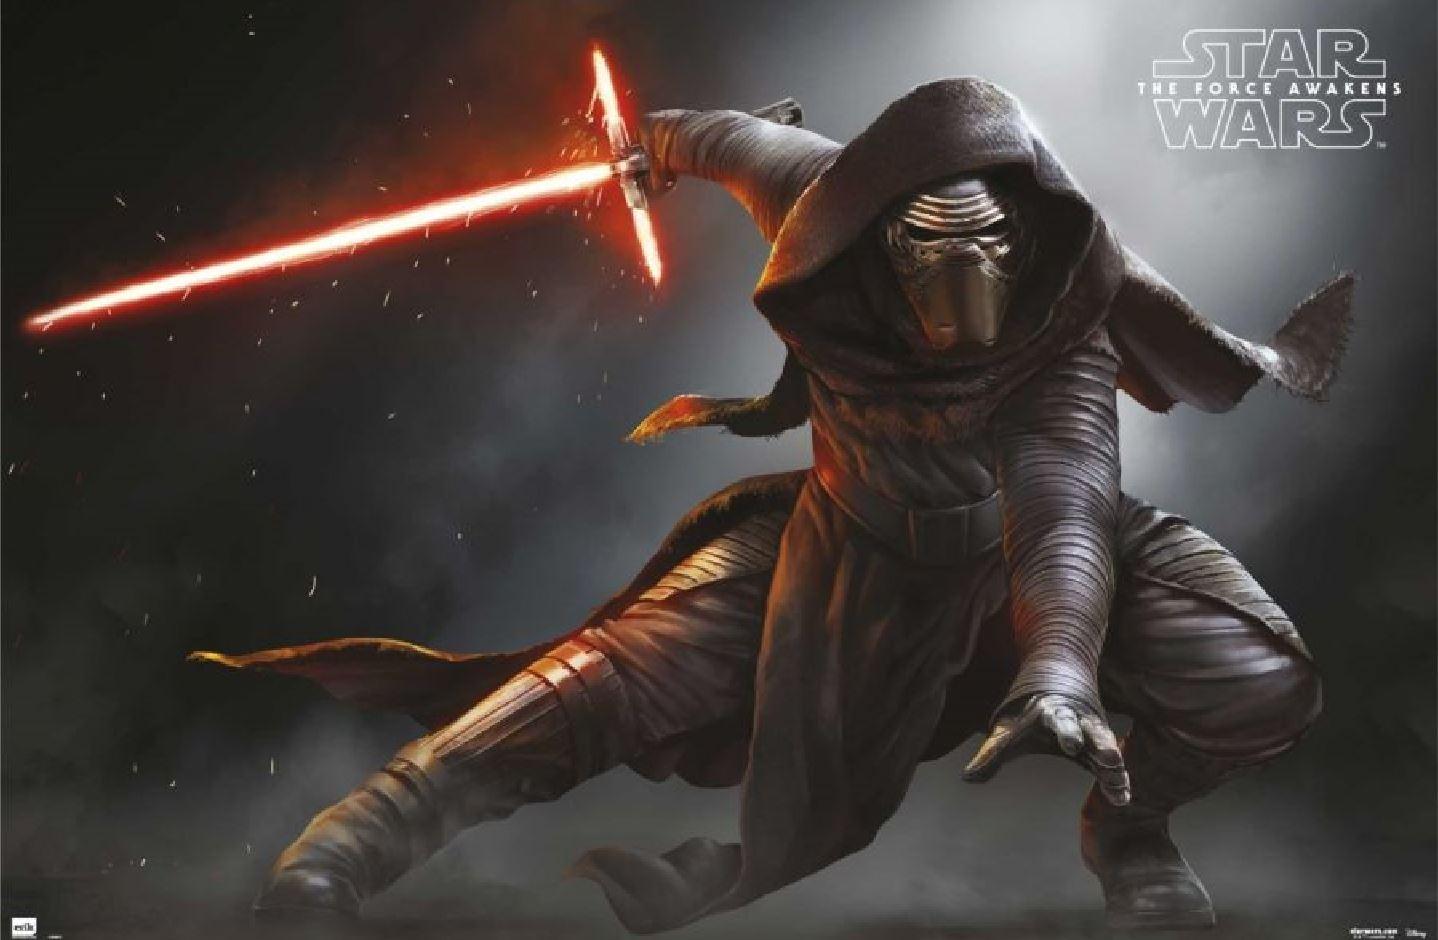 Kylo Ren in The Force Awakens poster